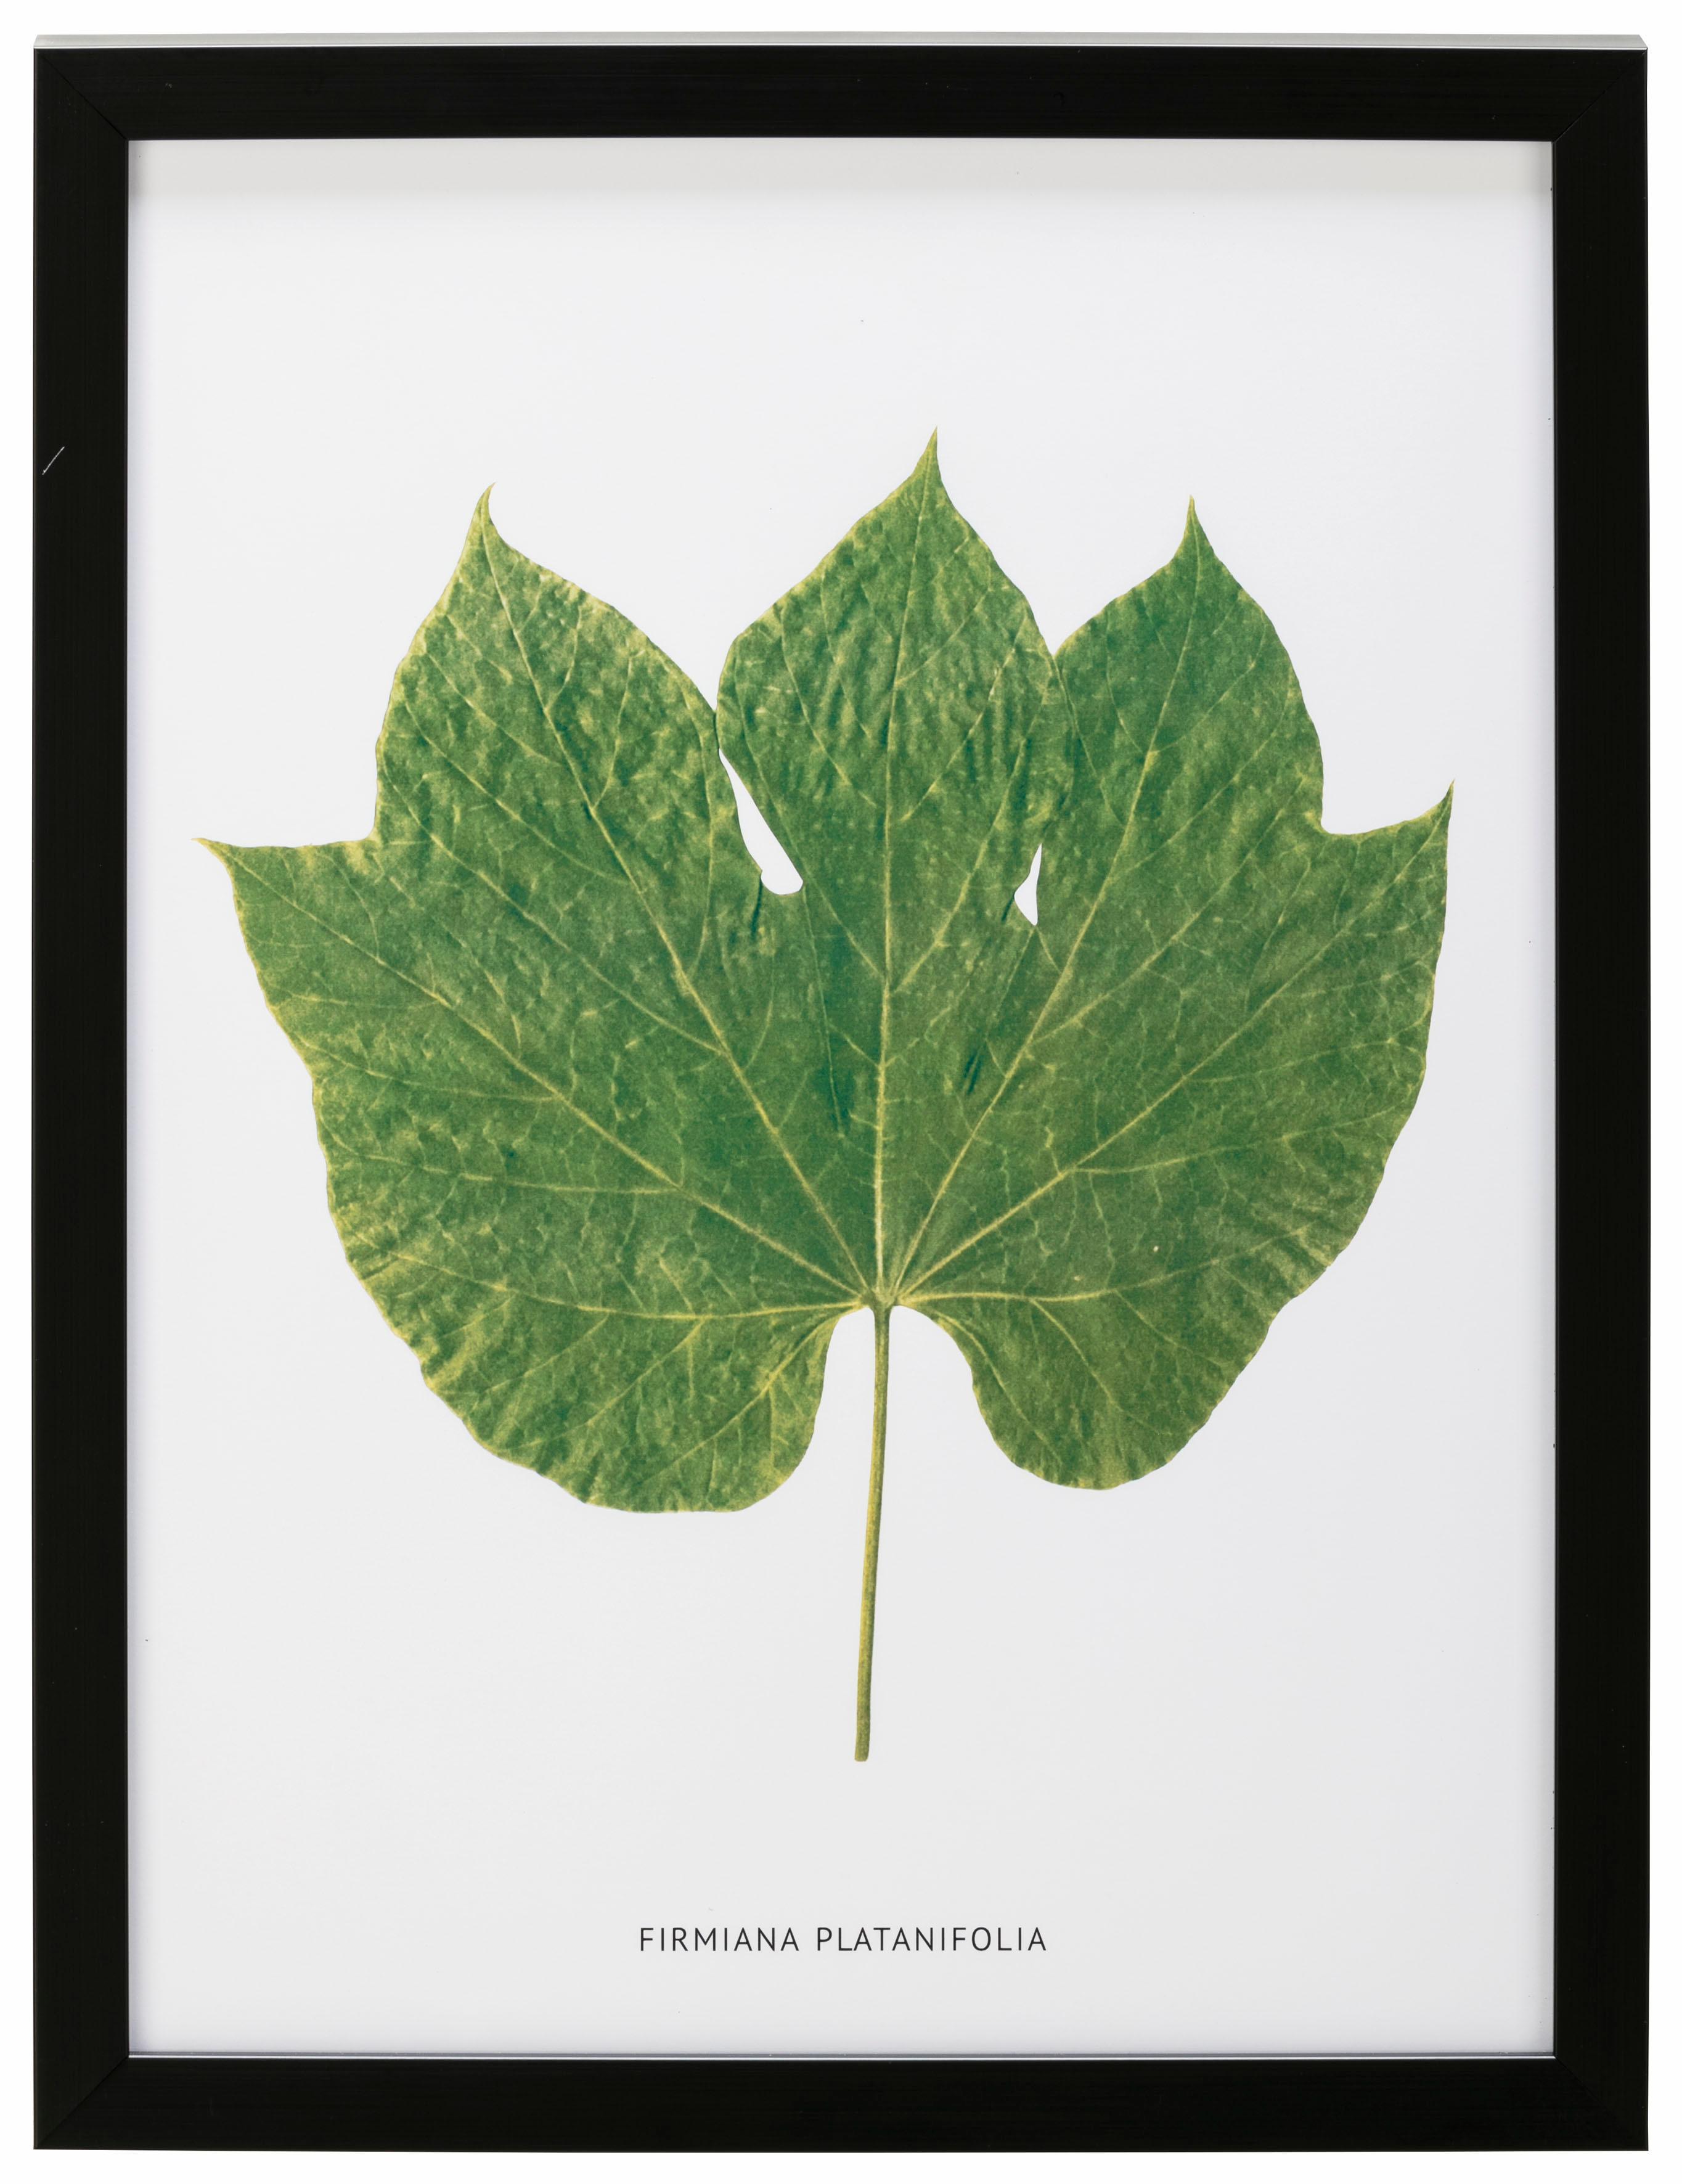 G&C Bild Blatt Firmiana Platanifolia Preisvergleich